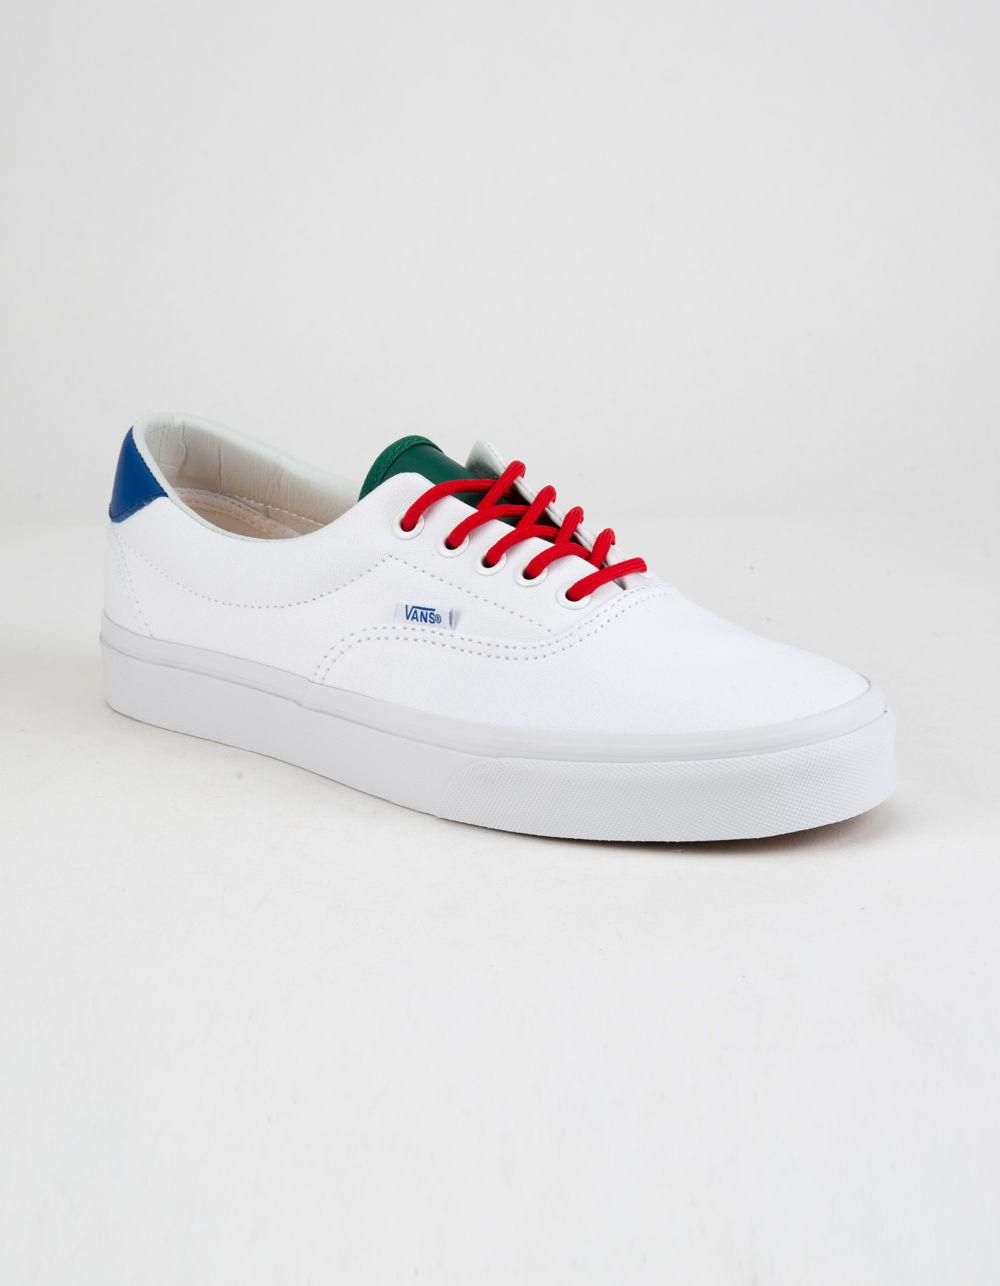 Lyst - Vans Yacht Club Era 59 True White Mens Shoes in White for Men b603dde40